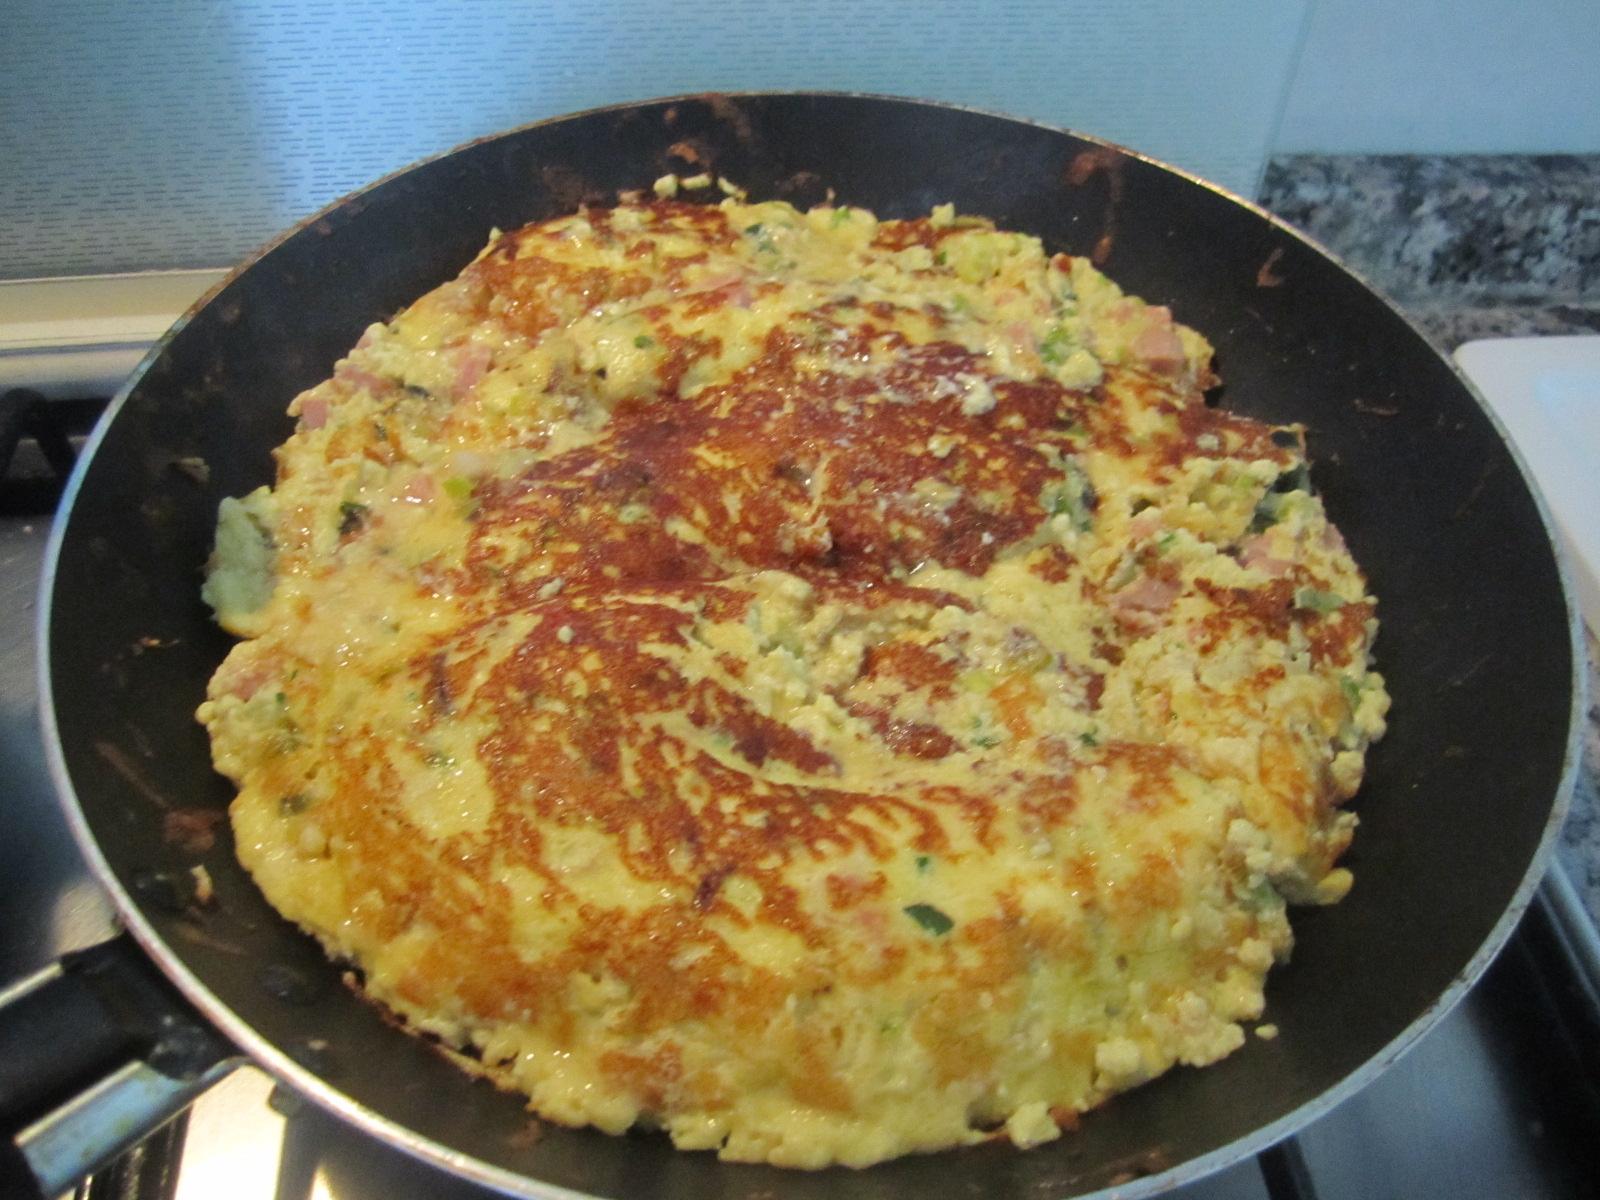 Img 0617 la cucina di loredana - Loredana in cucina ...